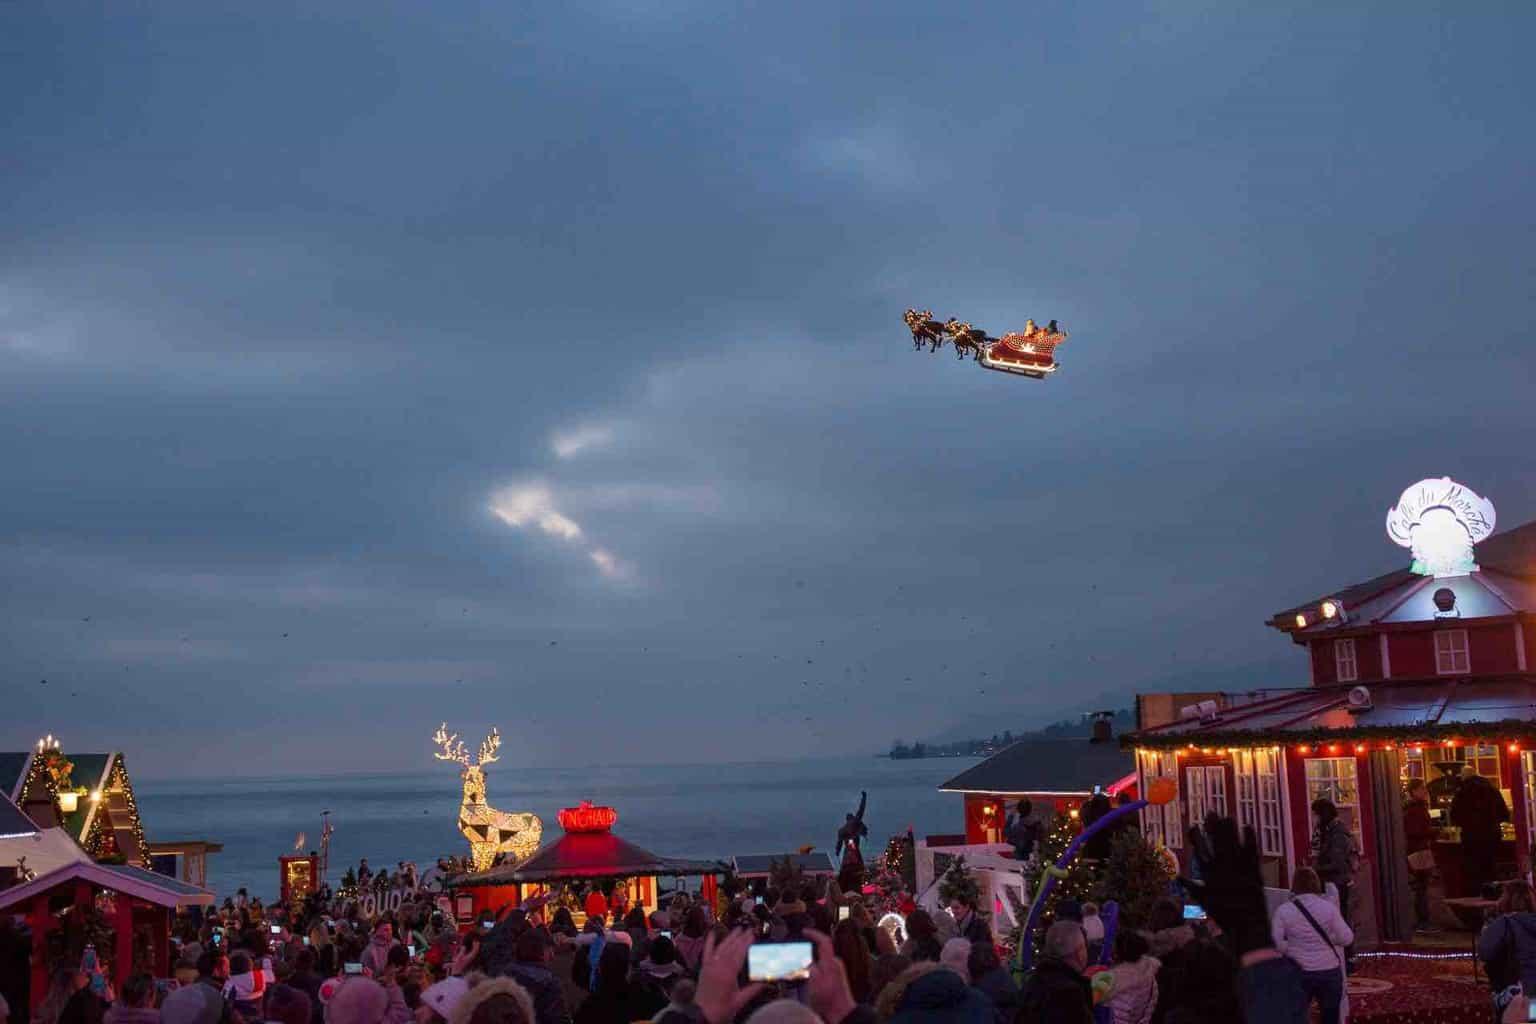 Montreux Noël Santa in the sky